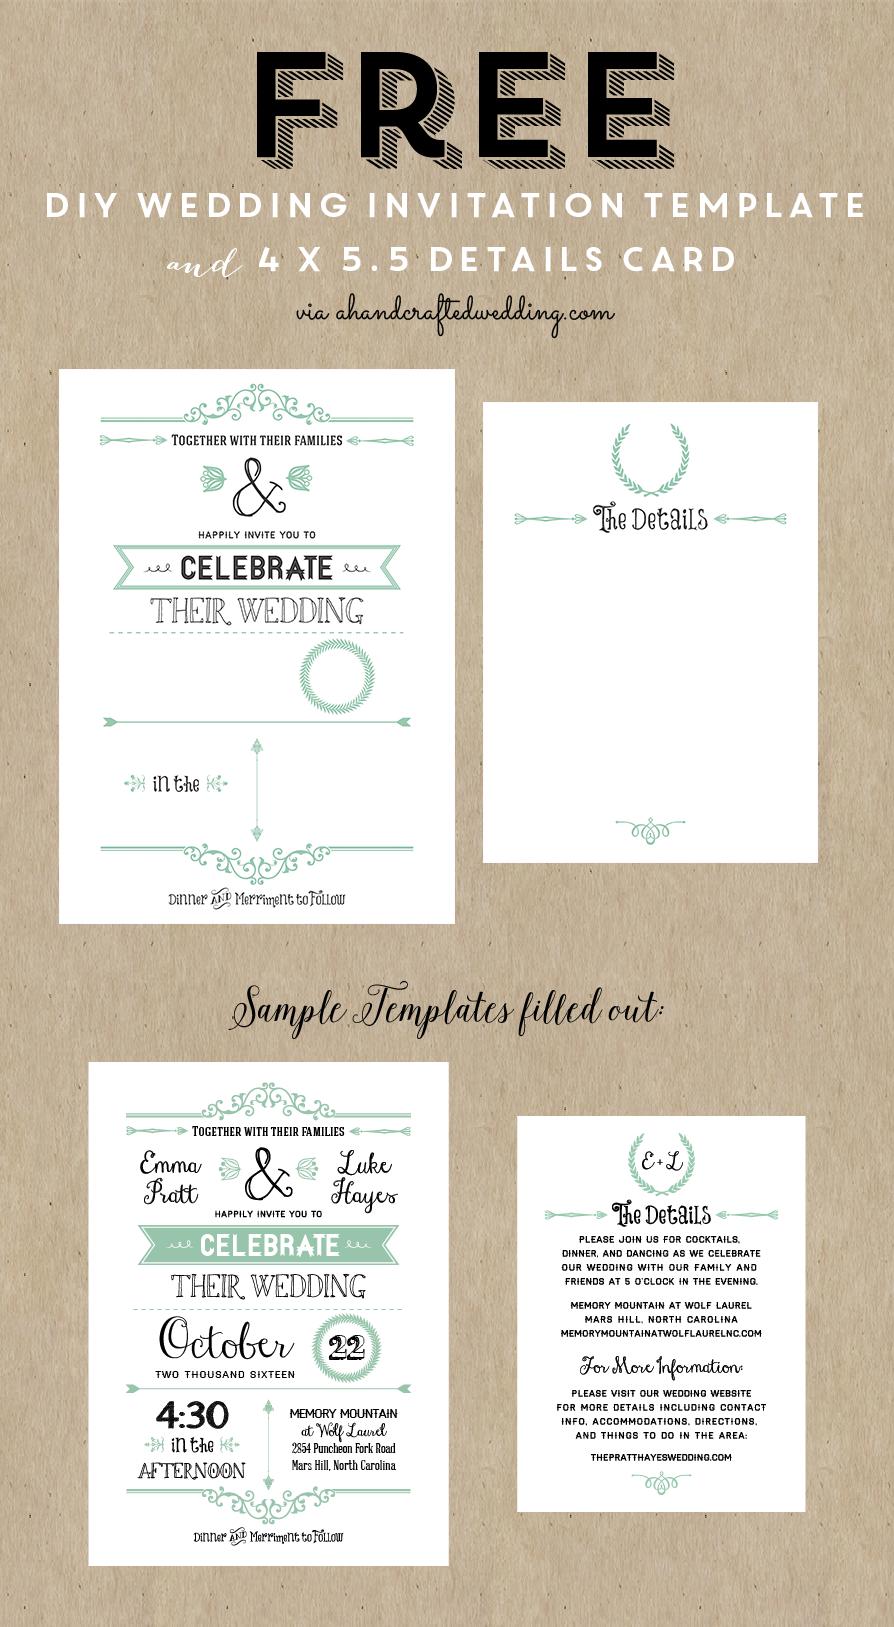 Free Printable Wedding Invitation Template | Wedding | Pinterest - Free Printable Wedding Invitation Templates